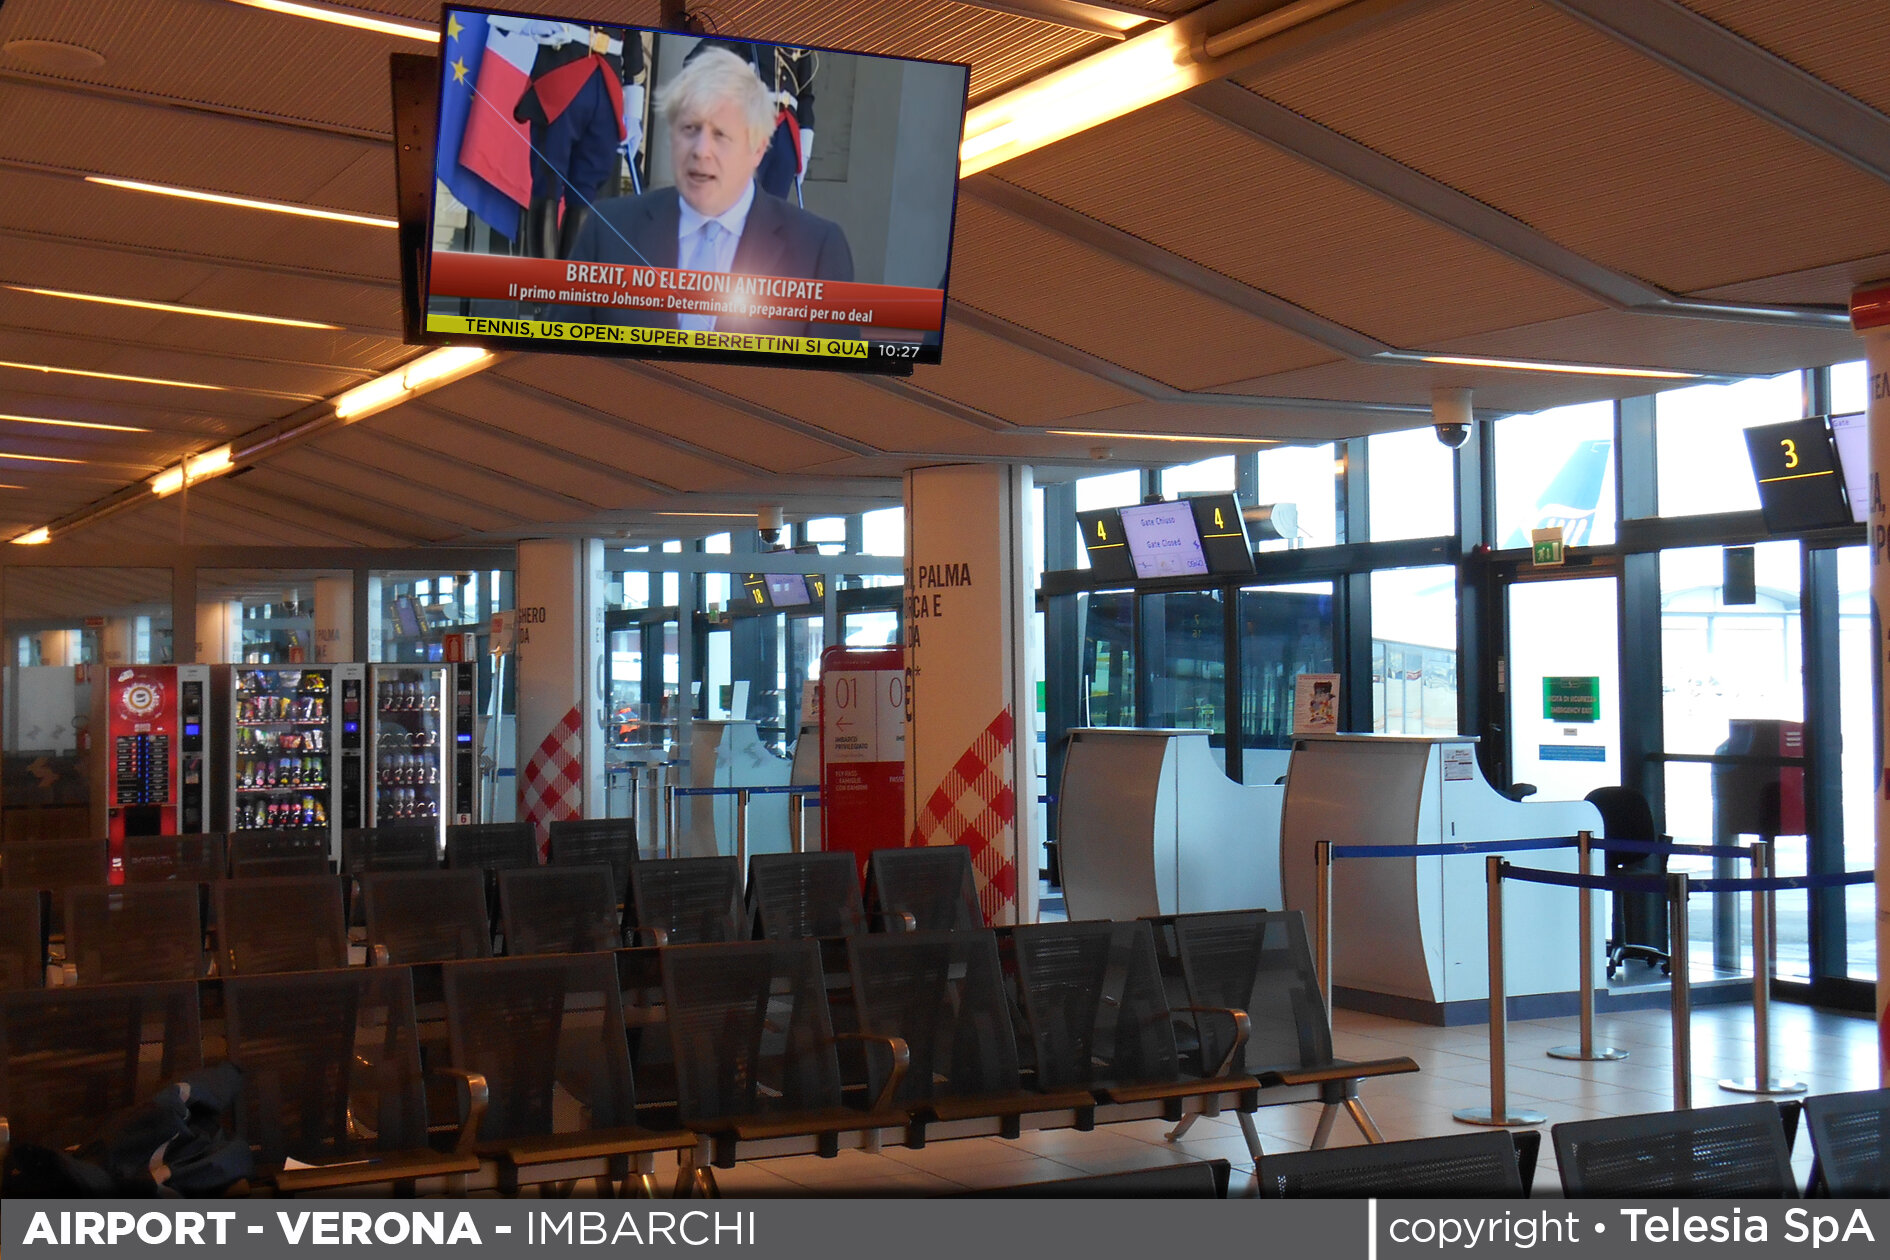 T_airportVerona1.jpg